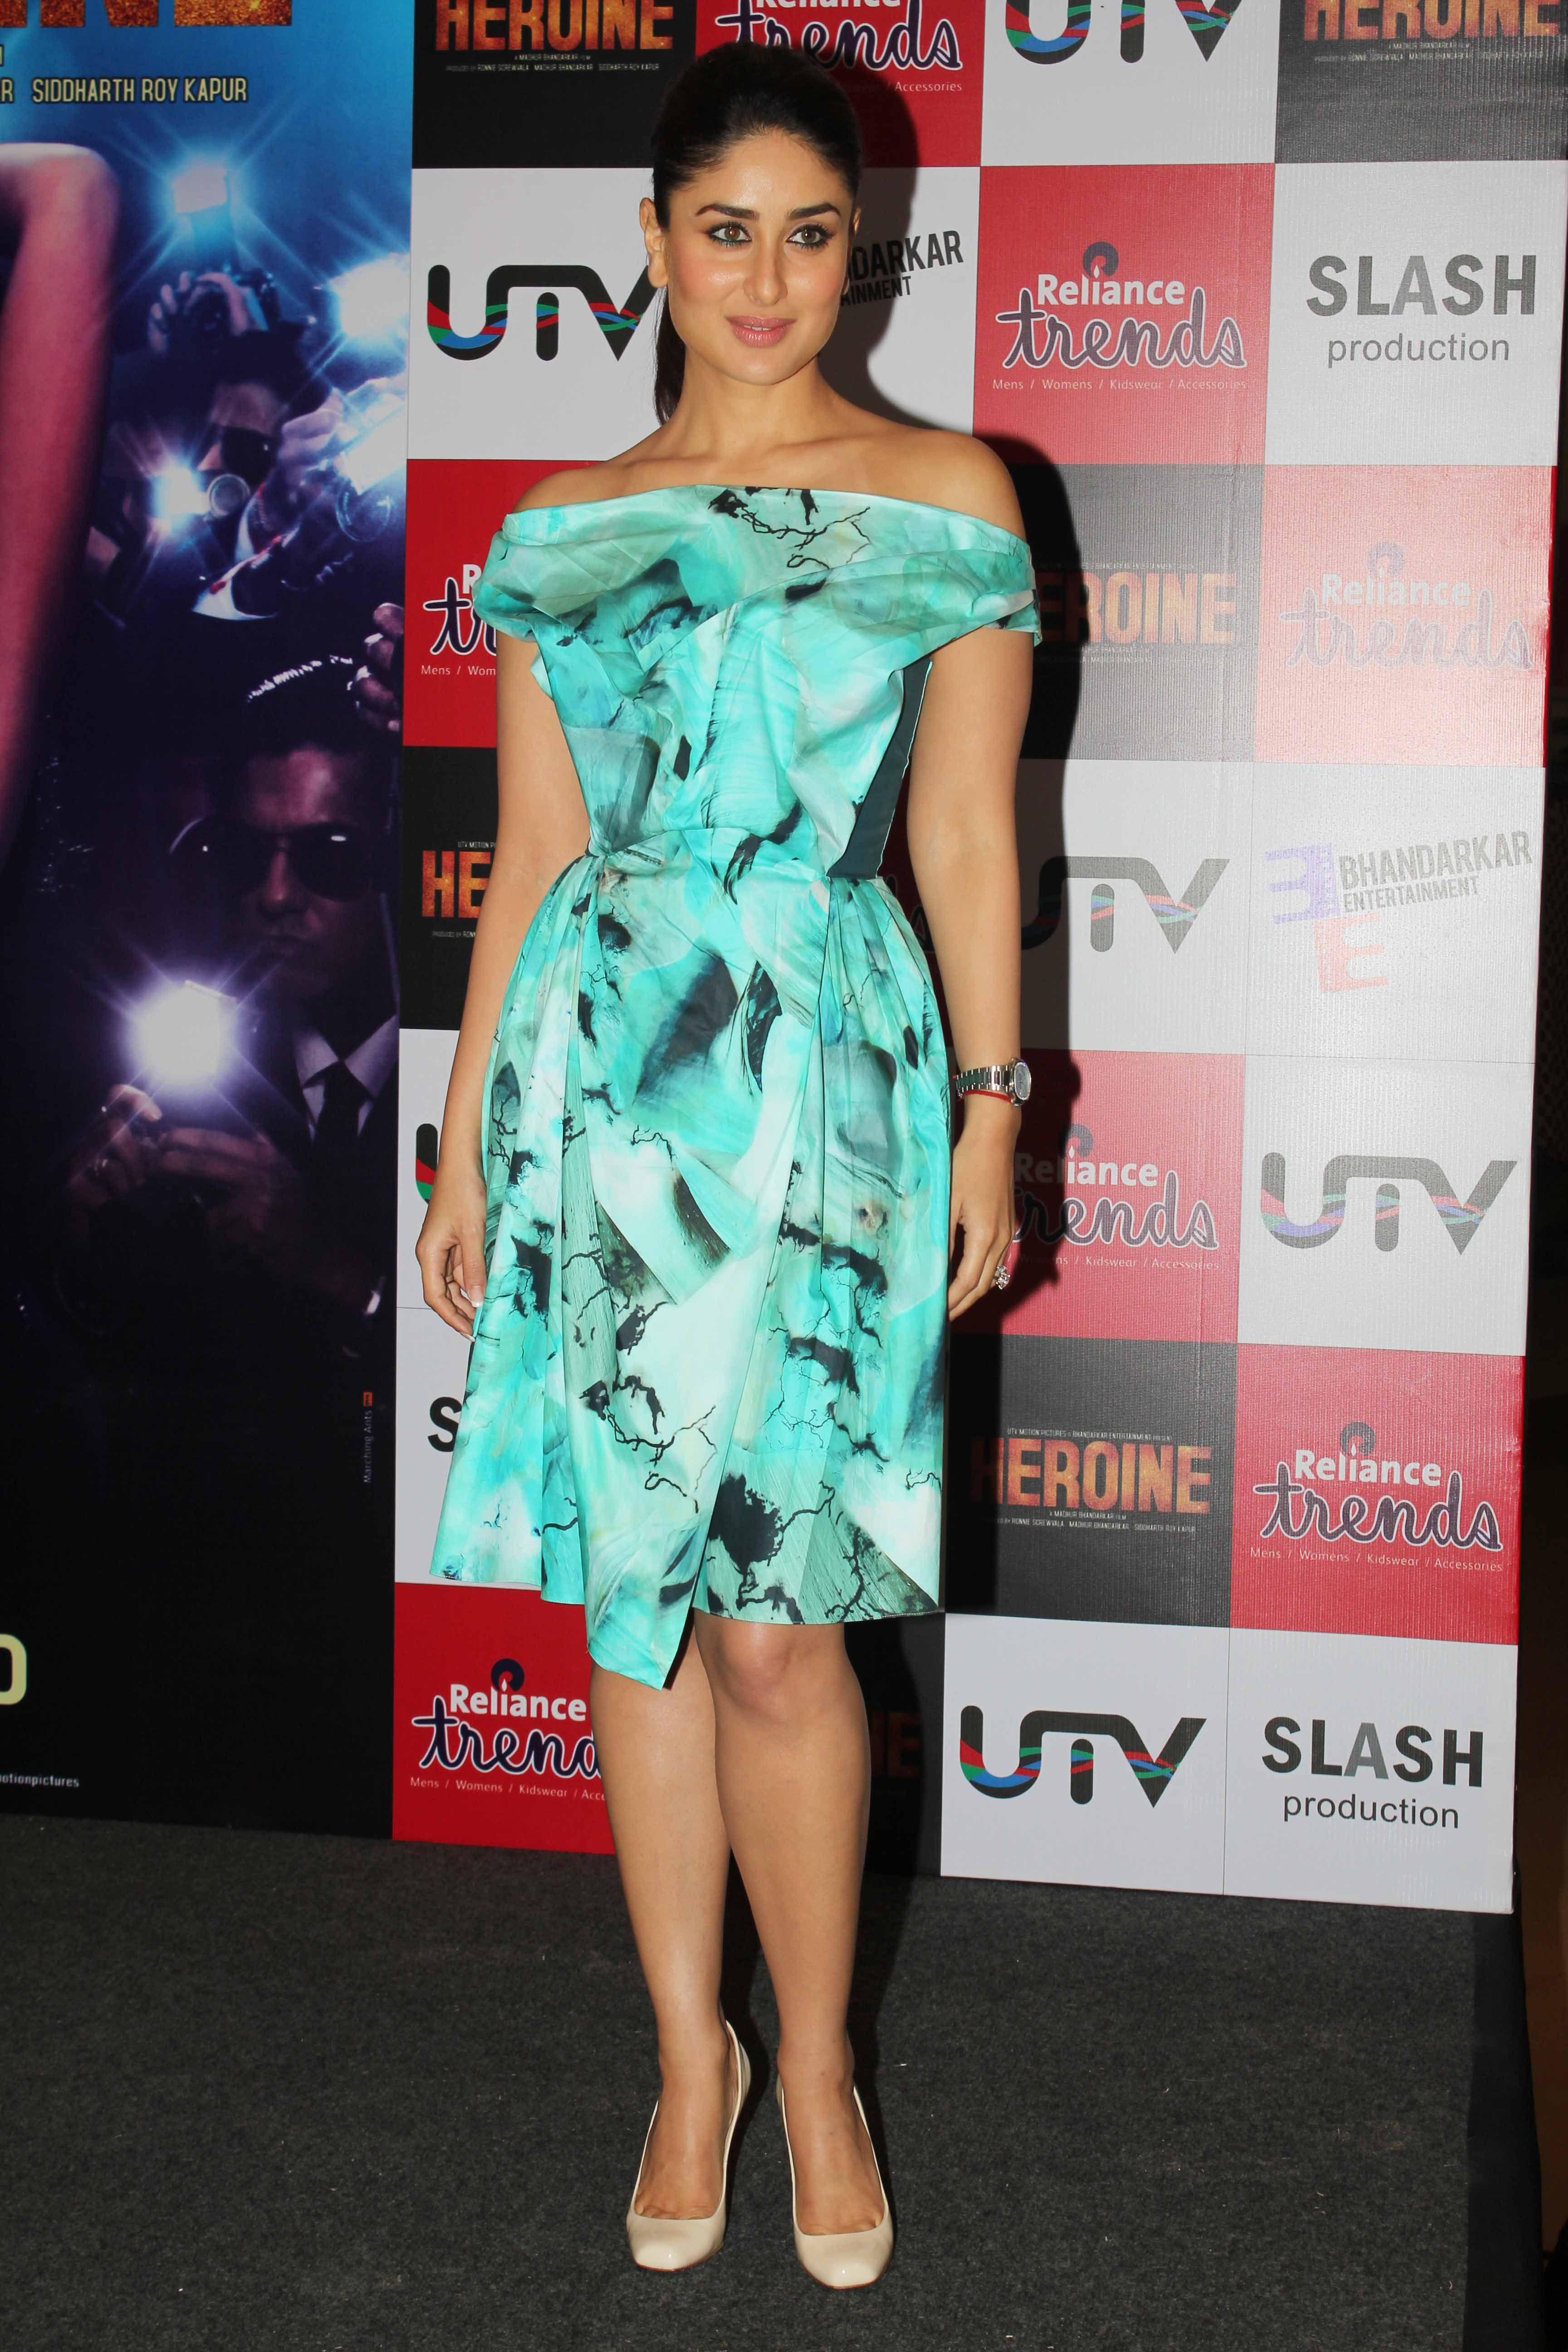 kareena-kapoor-at-heroine-movie-songs-launch-3 | kareena kapoor